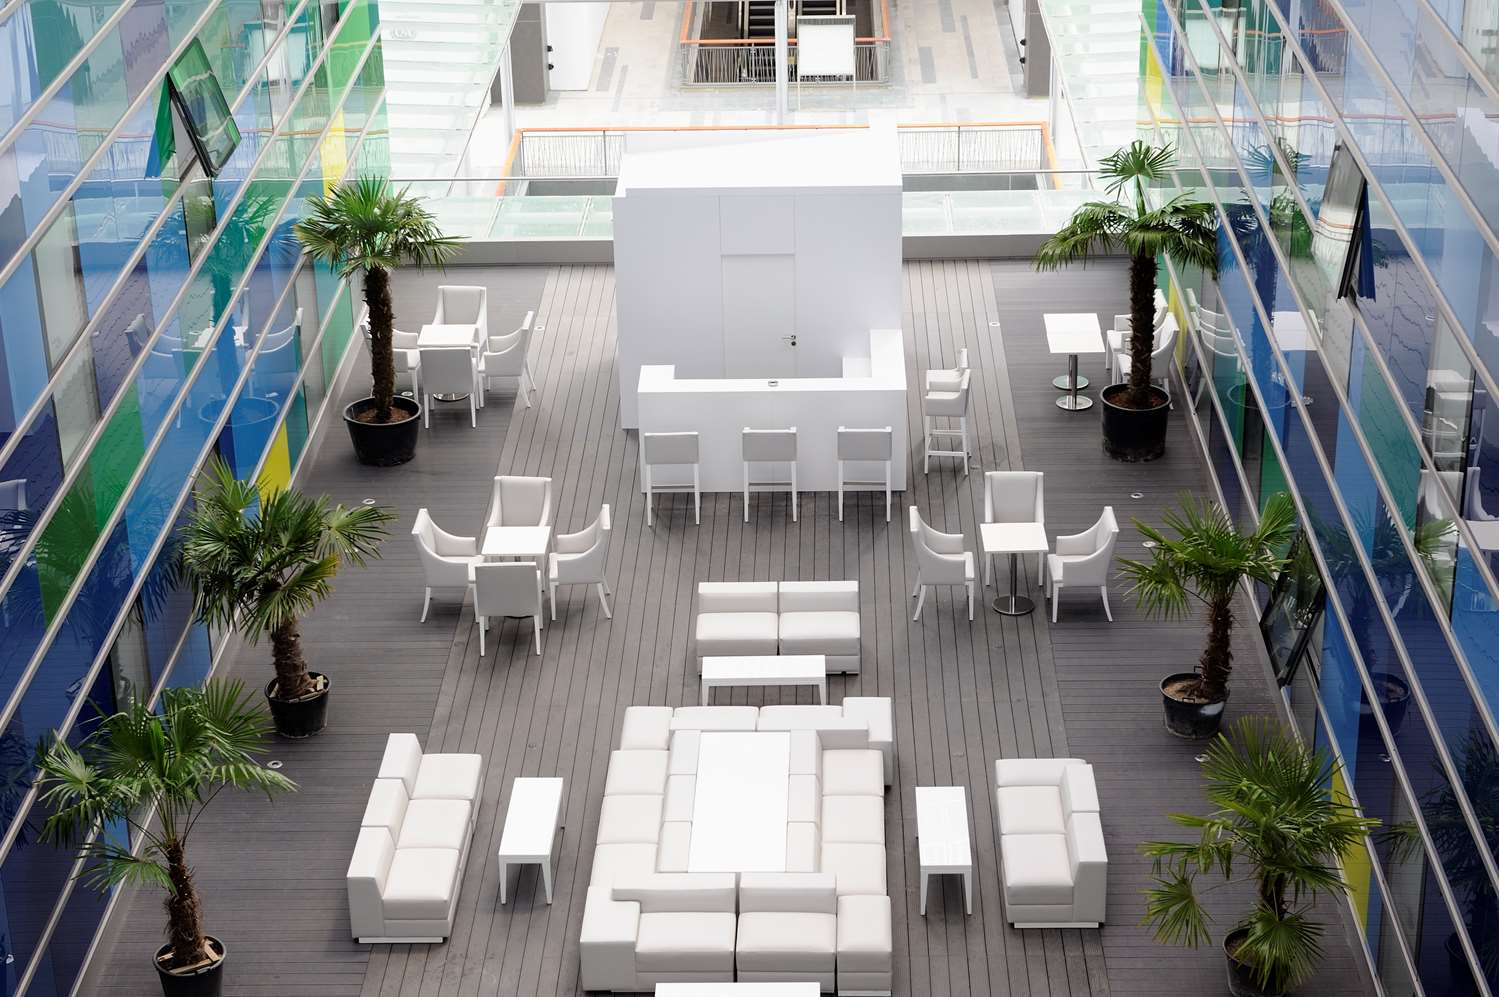 Restaurant - Hotel Kyriad Prestige Perpignan Centre Del Mon